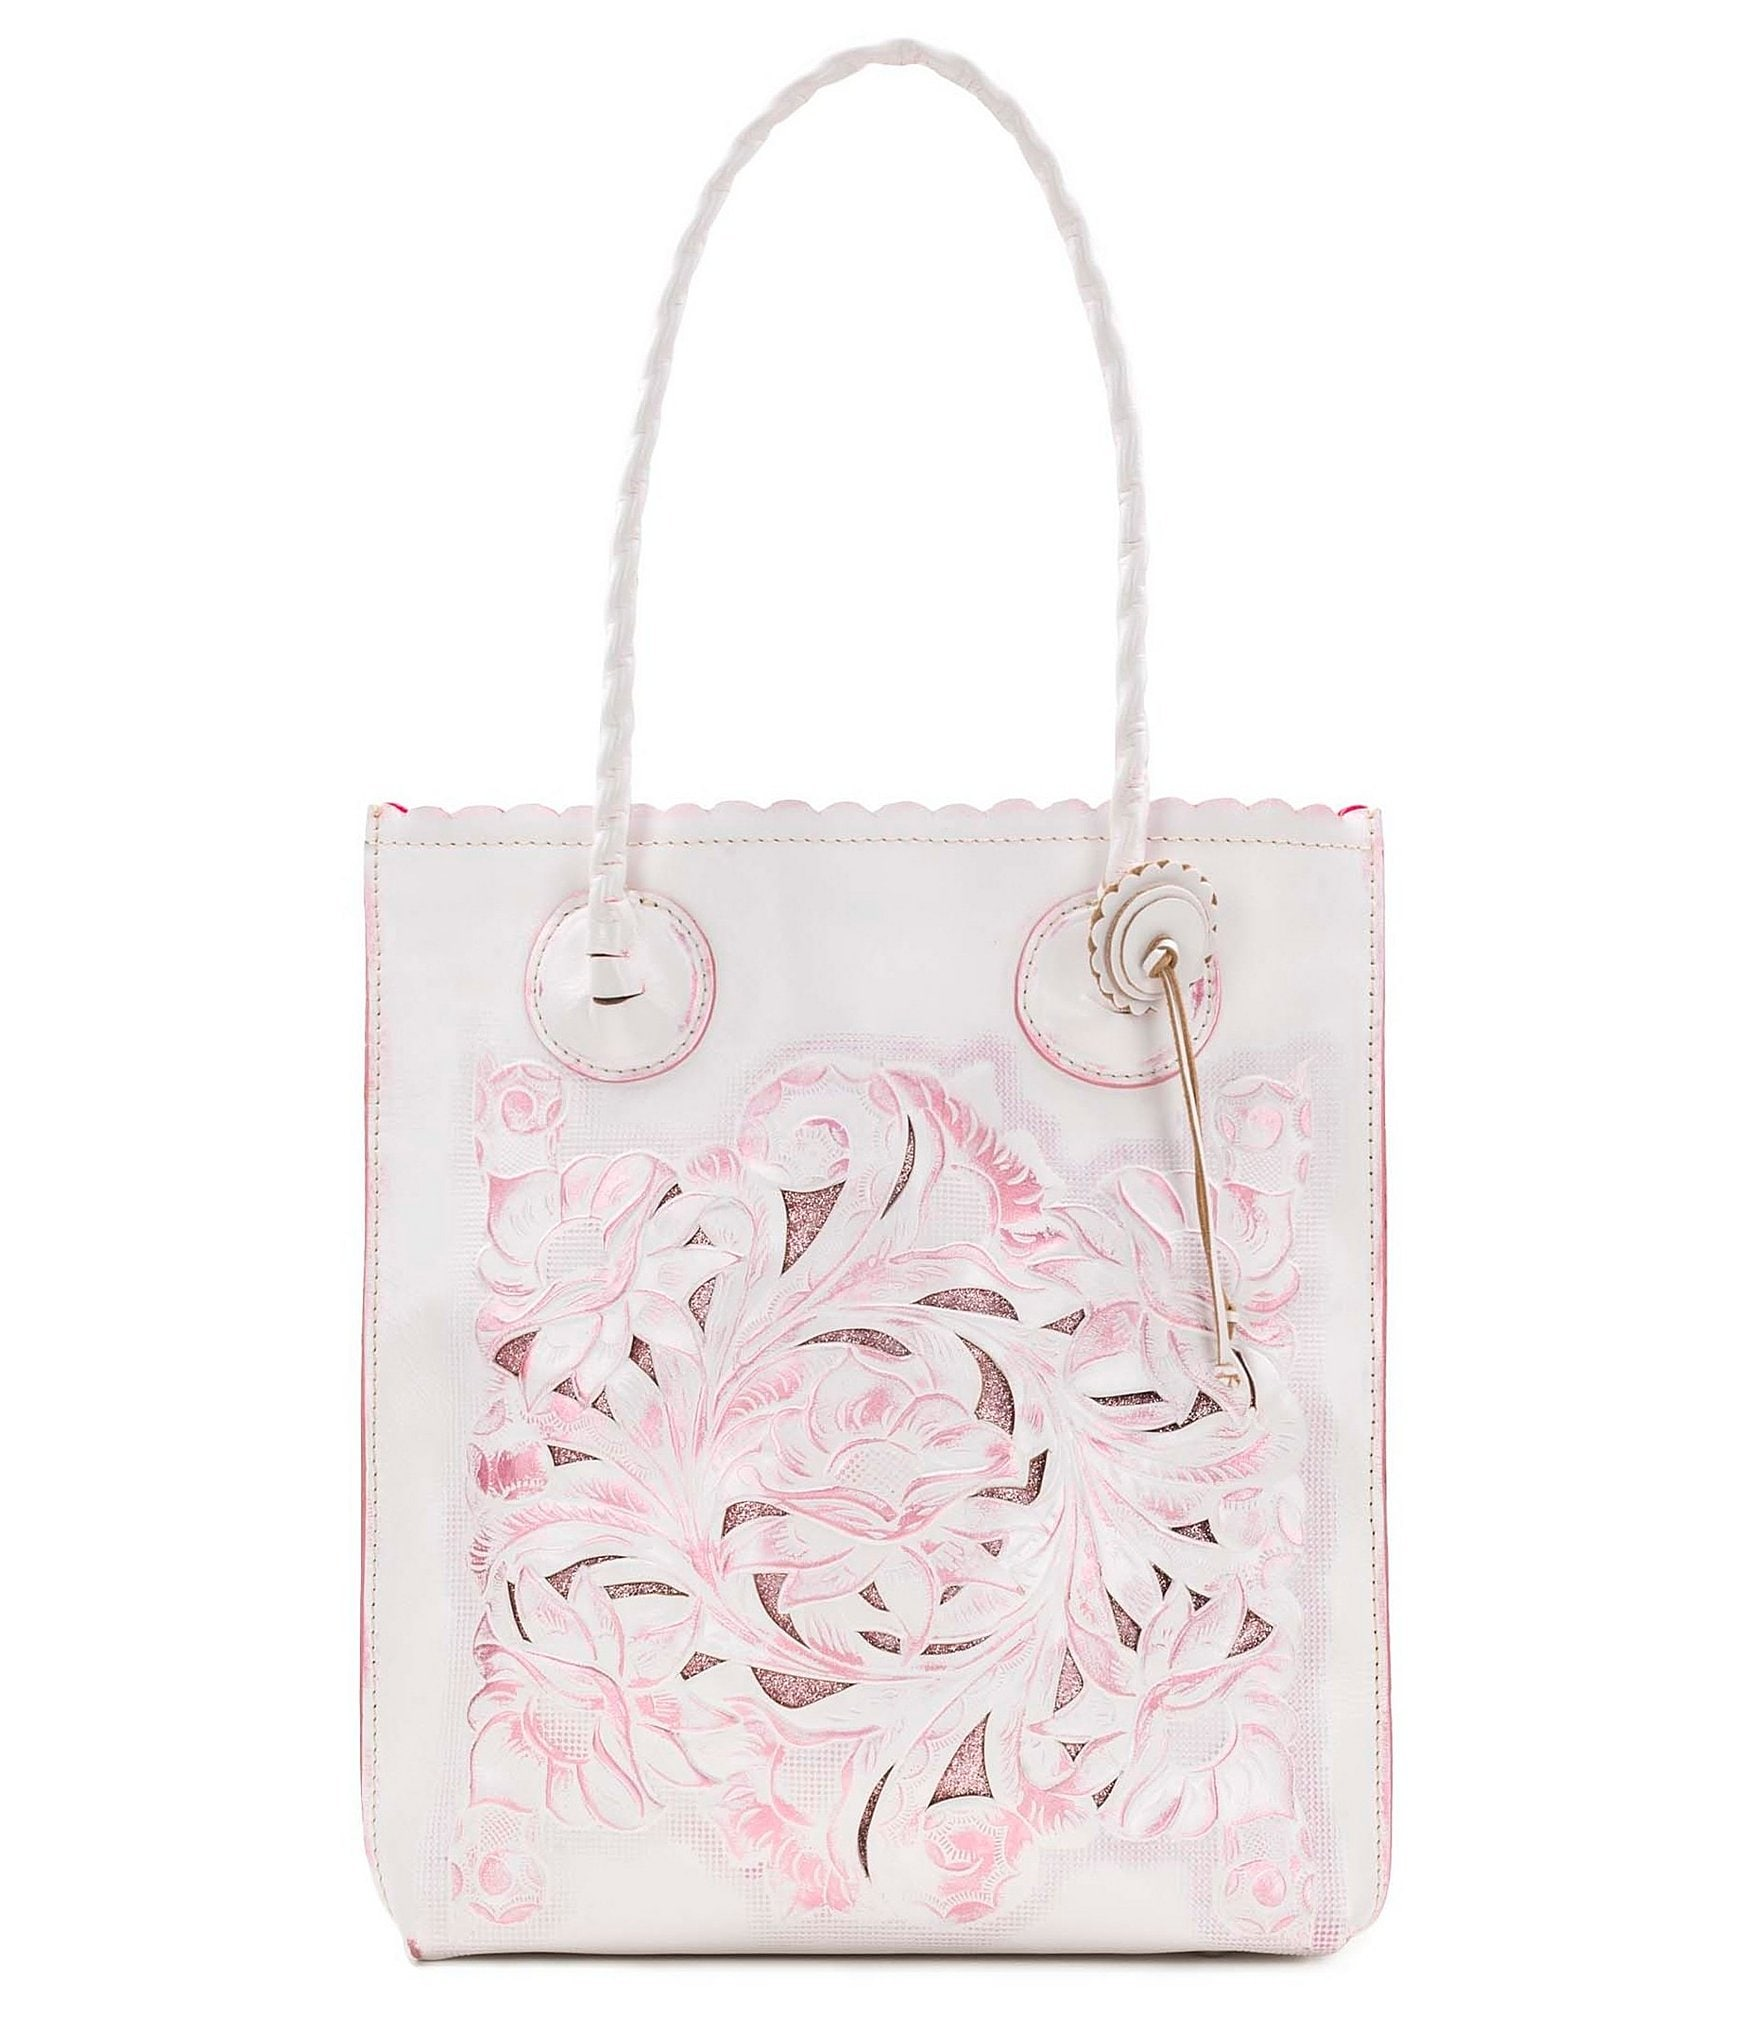 Tote Bag - Flower Child 3 by VIDA VIDA RJ9QN